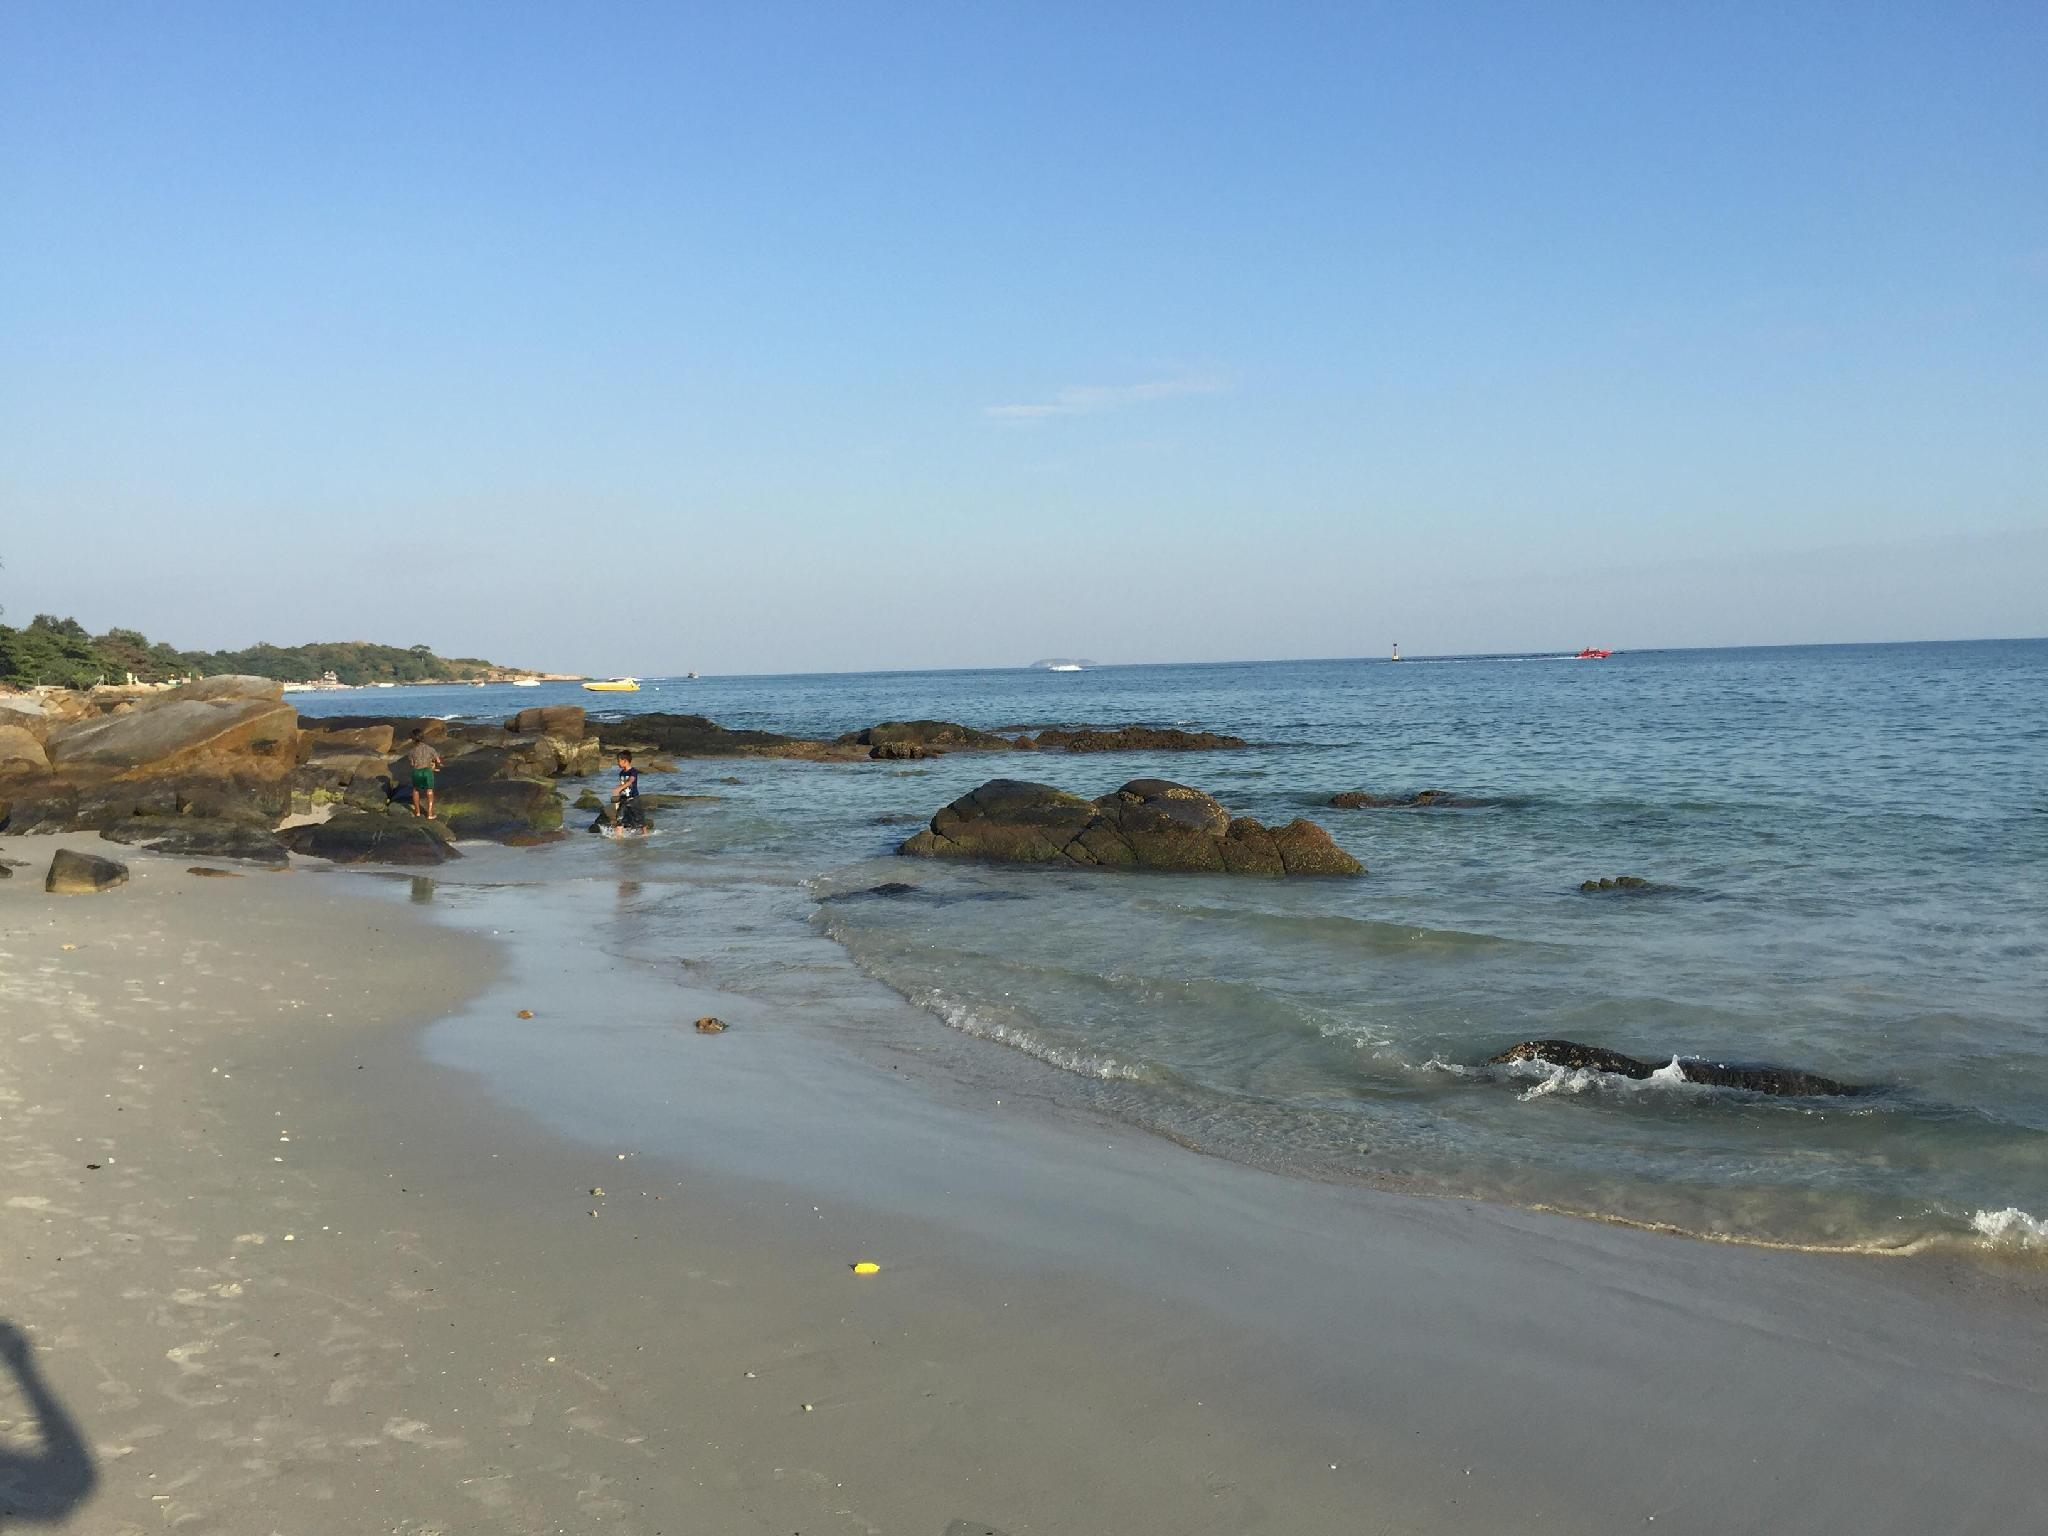 Sea Breeze Resort ซี บรีซ รีสอร์ท